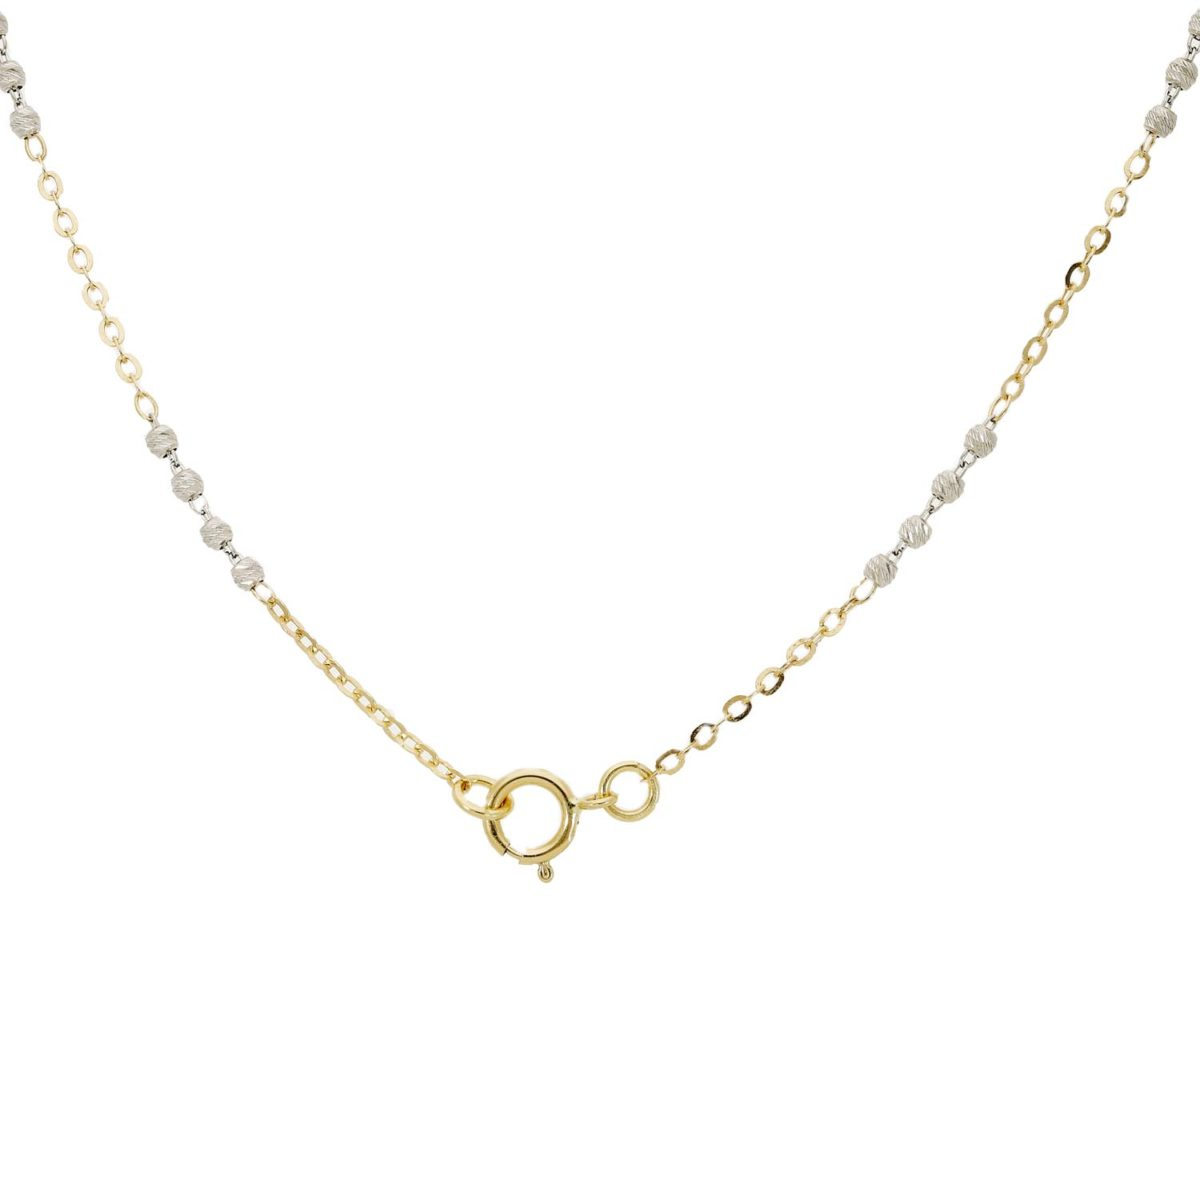 Gemstones NecklaceStyle #: WLI-J13398FJN